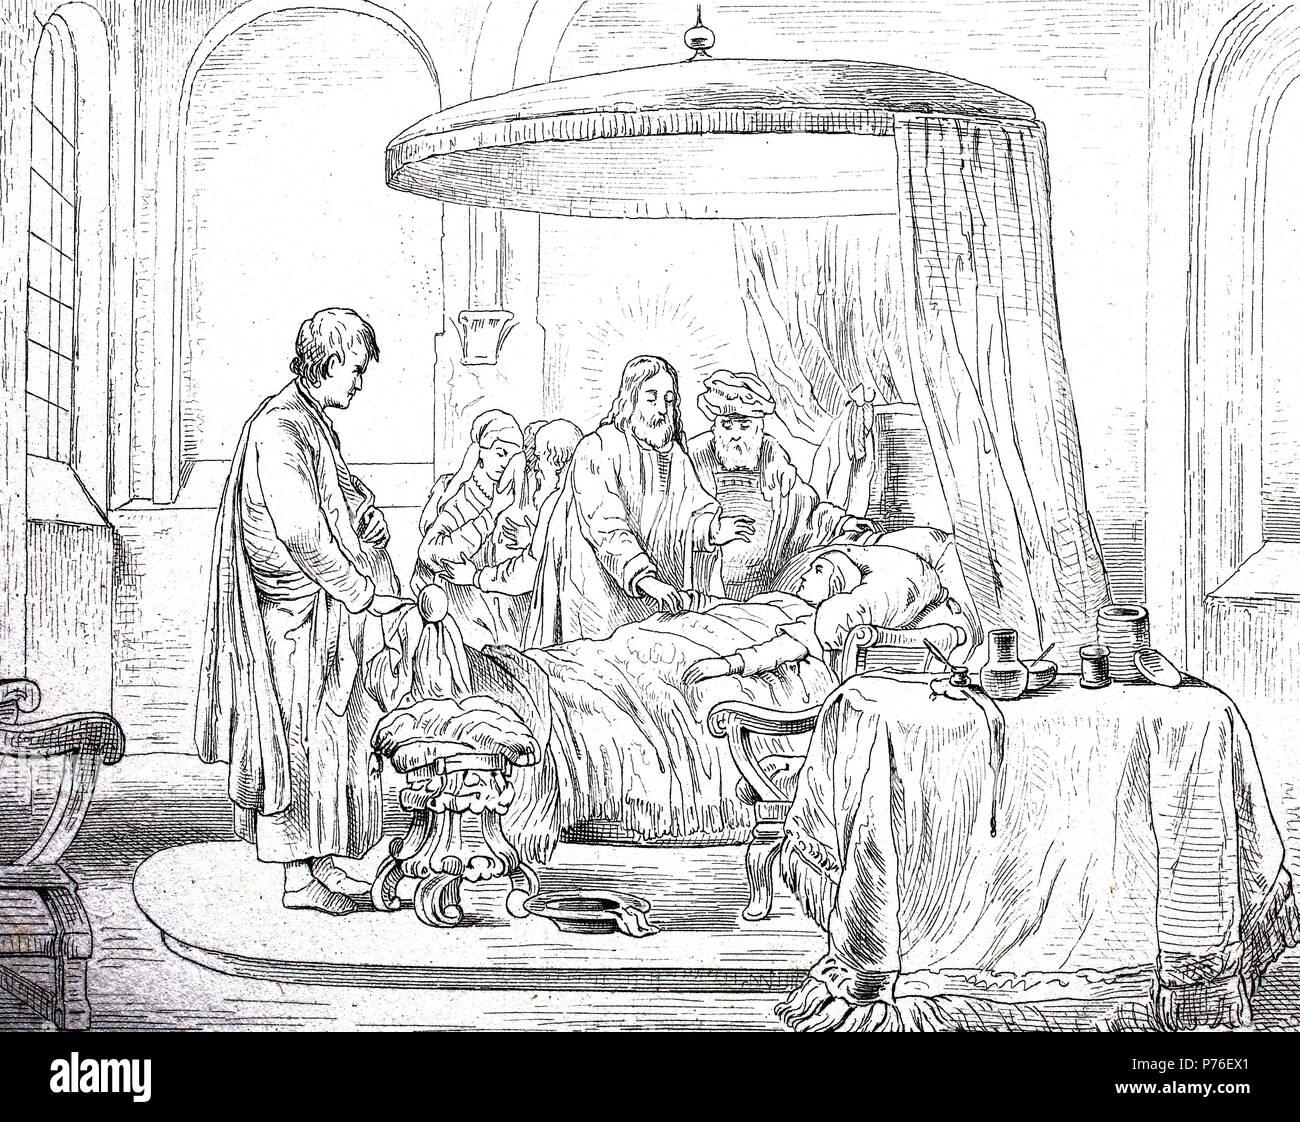 The Awakening of Jairi Töchterlein, by van der Eeckhout, digital improved reproduction of an original print from the year 1881 - Stock Image